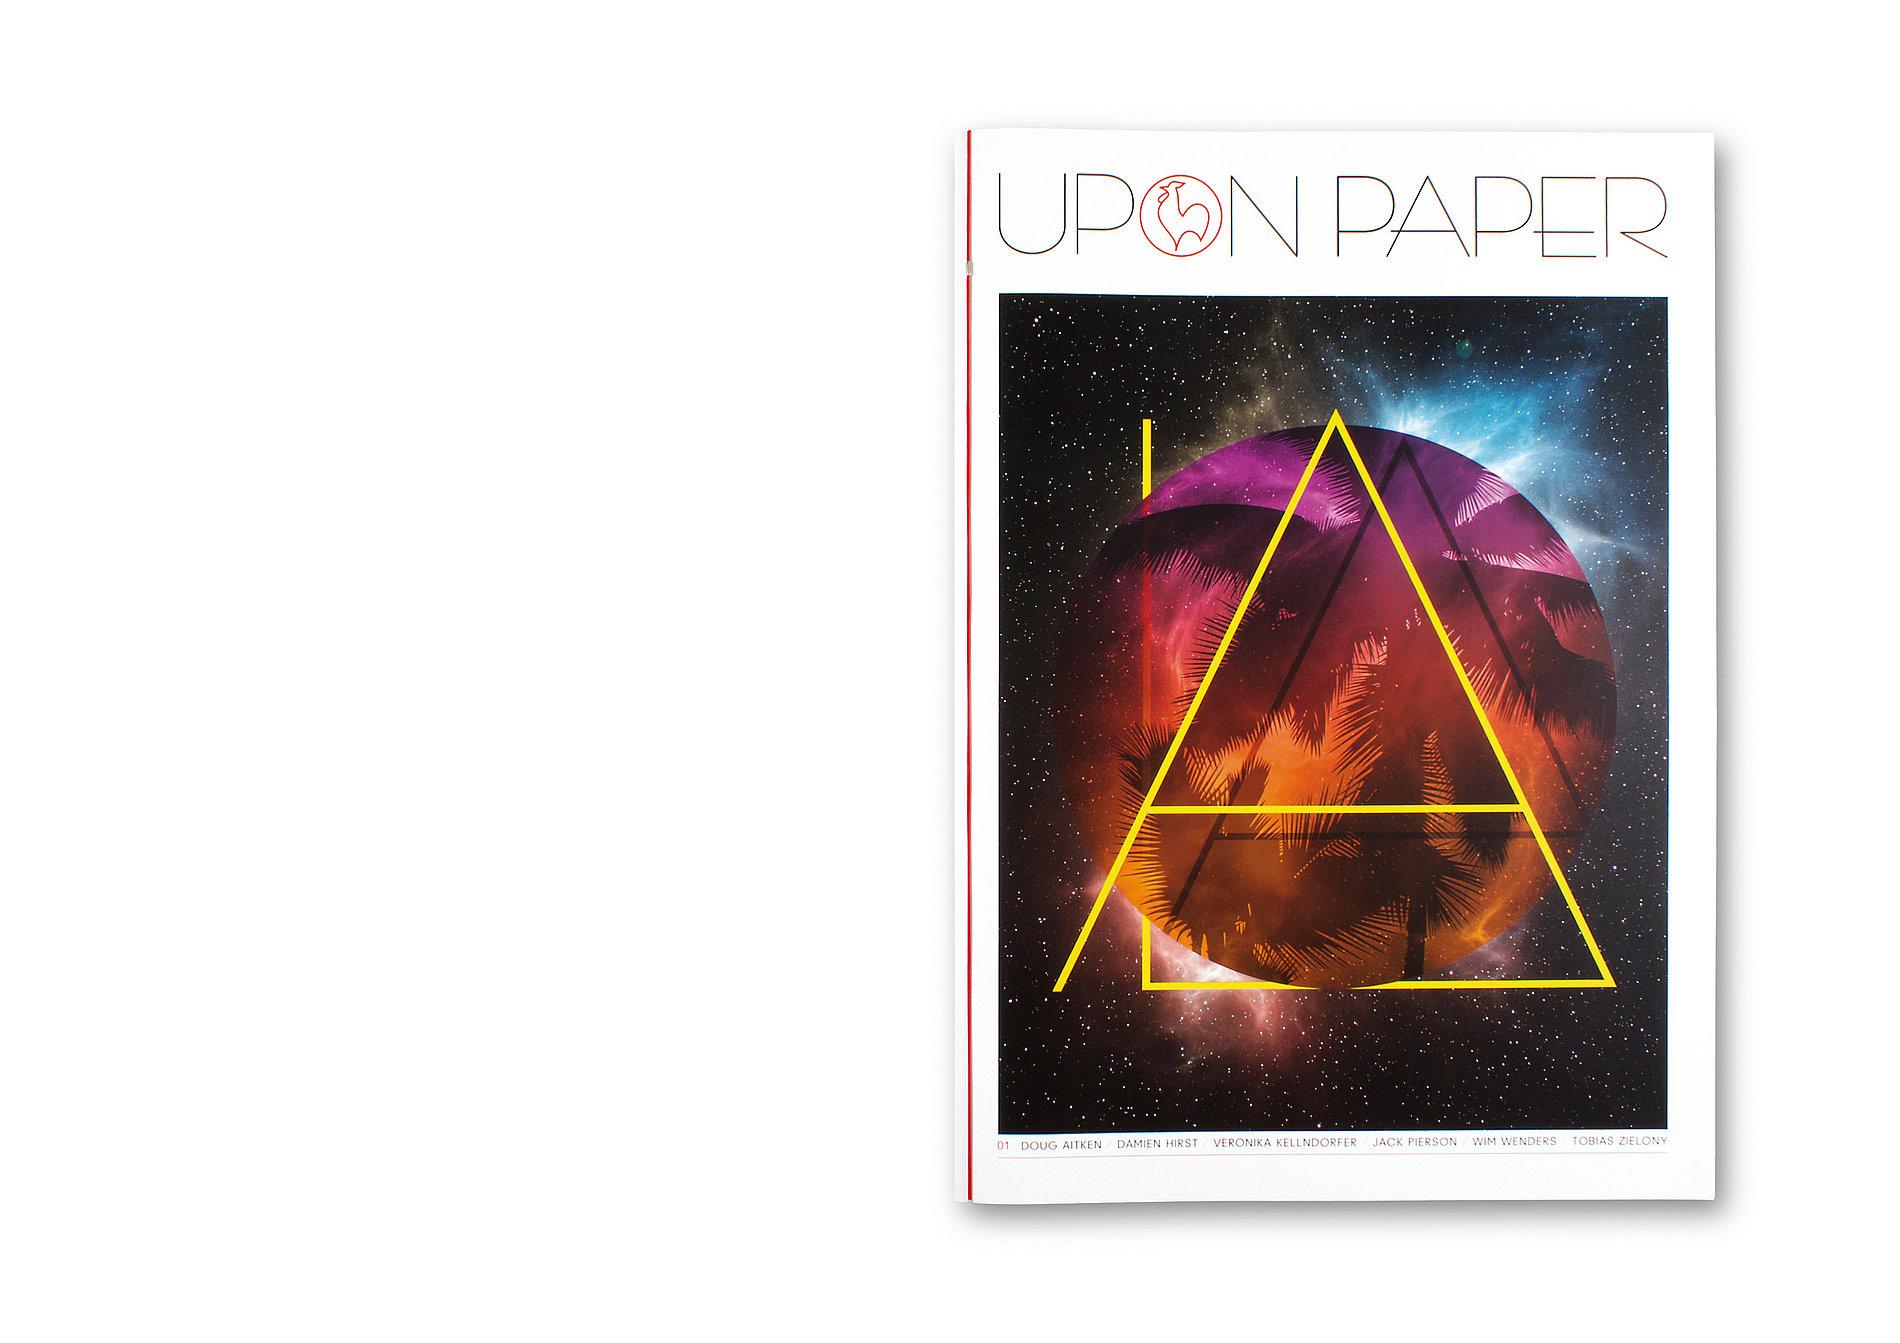 UPON PAPER | Red Dot Design Award